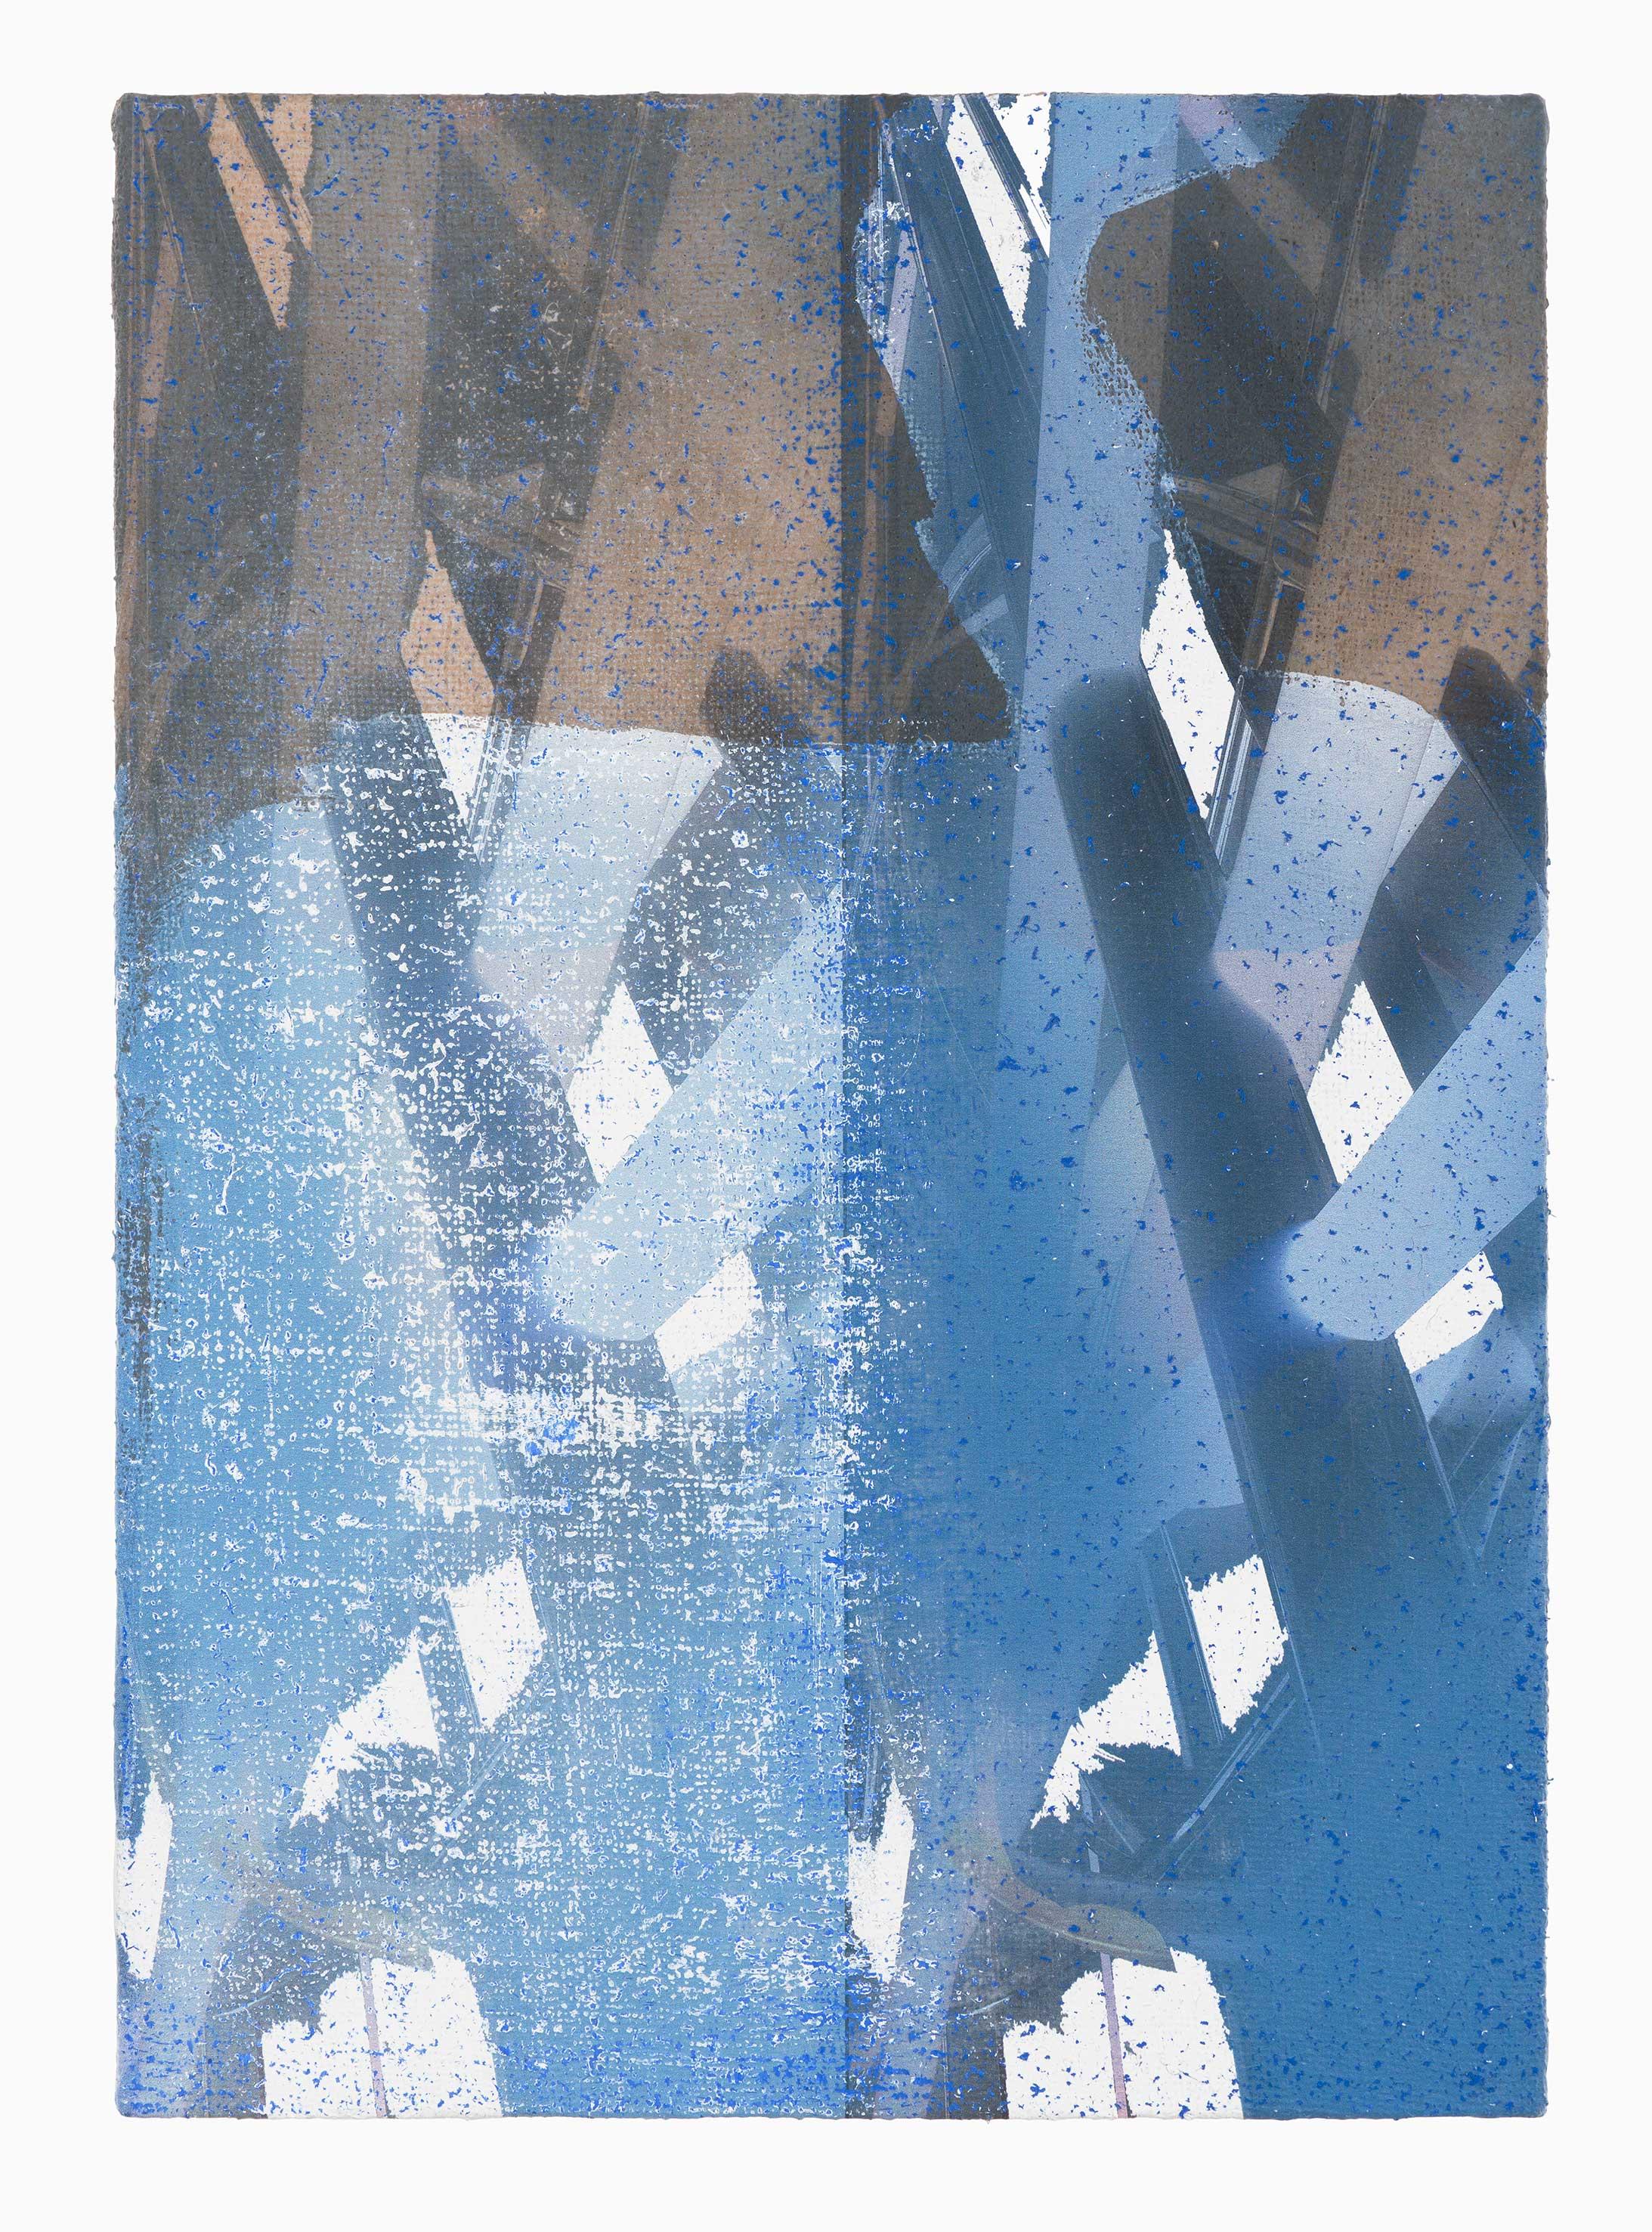 PETER ALWAST  Untitled (Blue)  2018  oil pastel, archival UV cured print on hessian 35.5 x 50.5cm